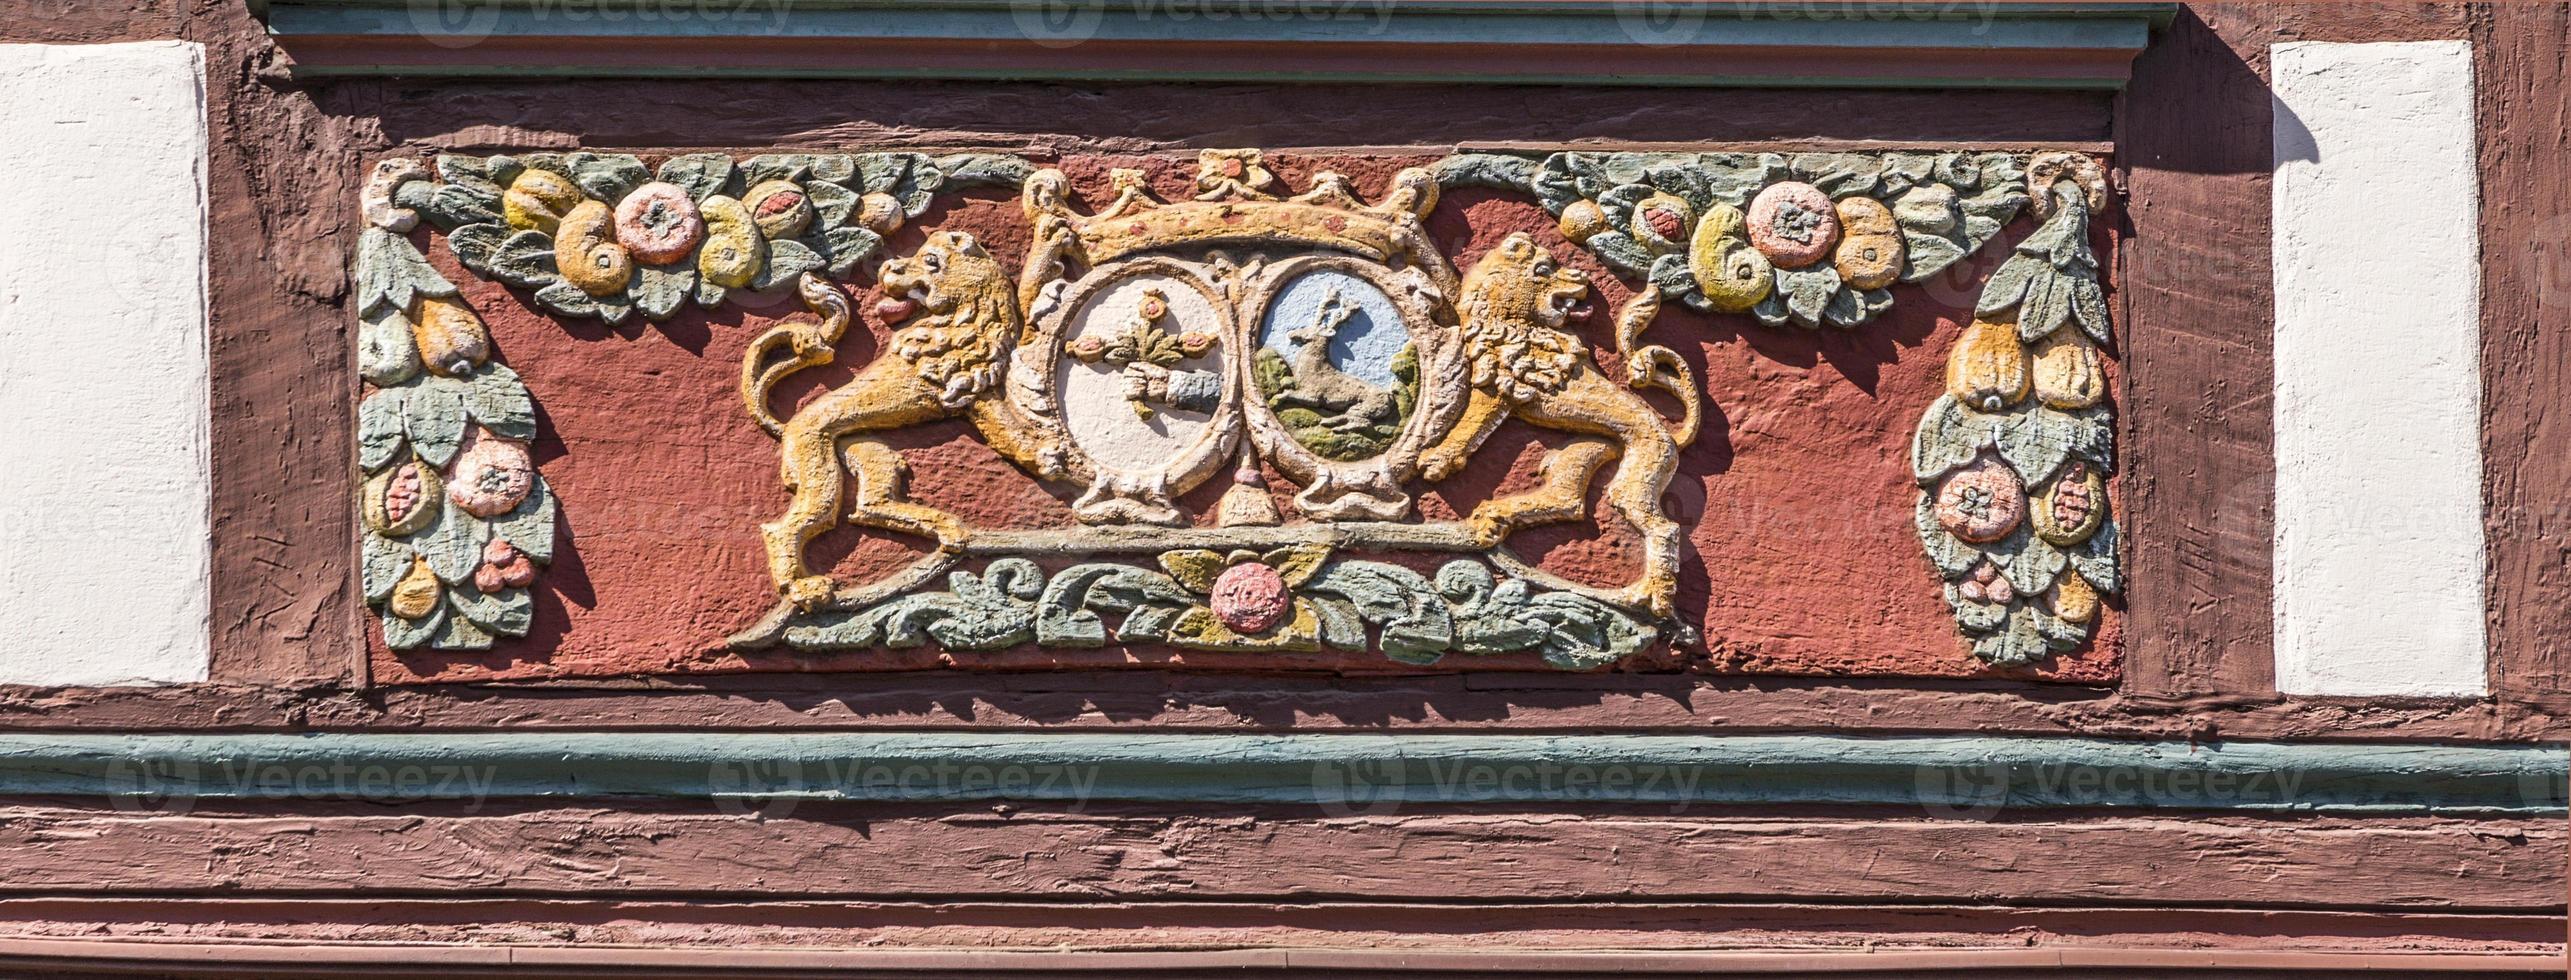 escultura tradicional em casa de enxaimel com símbolos foto